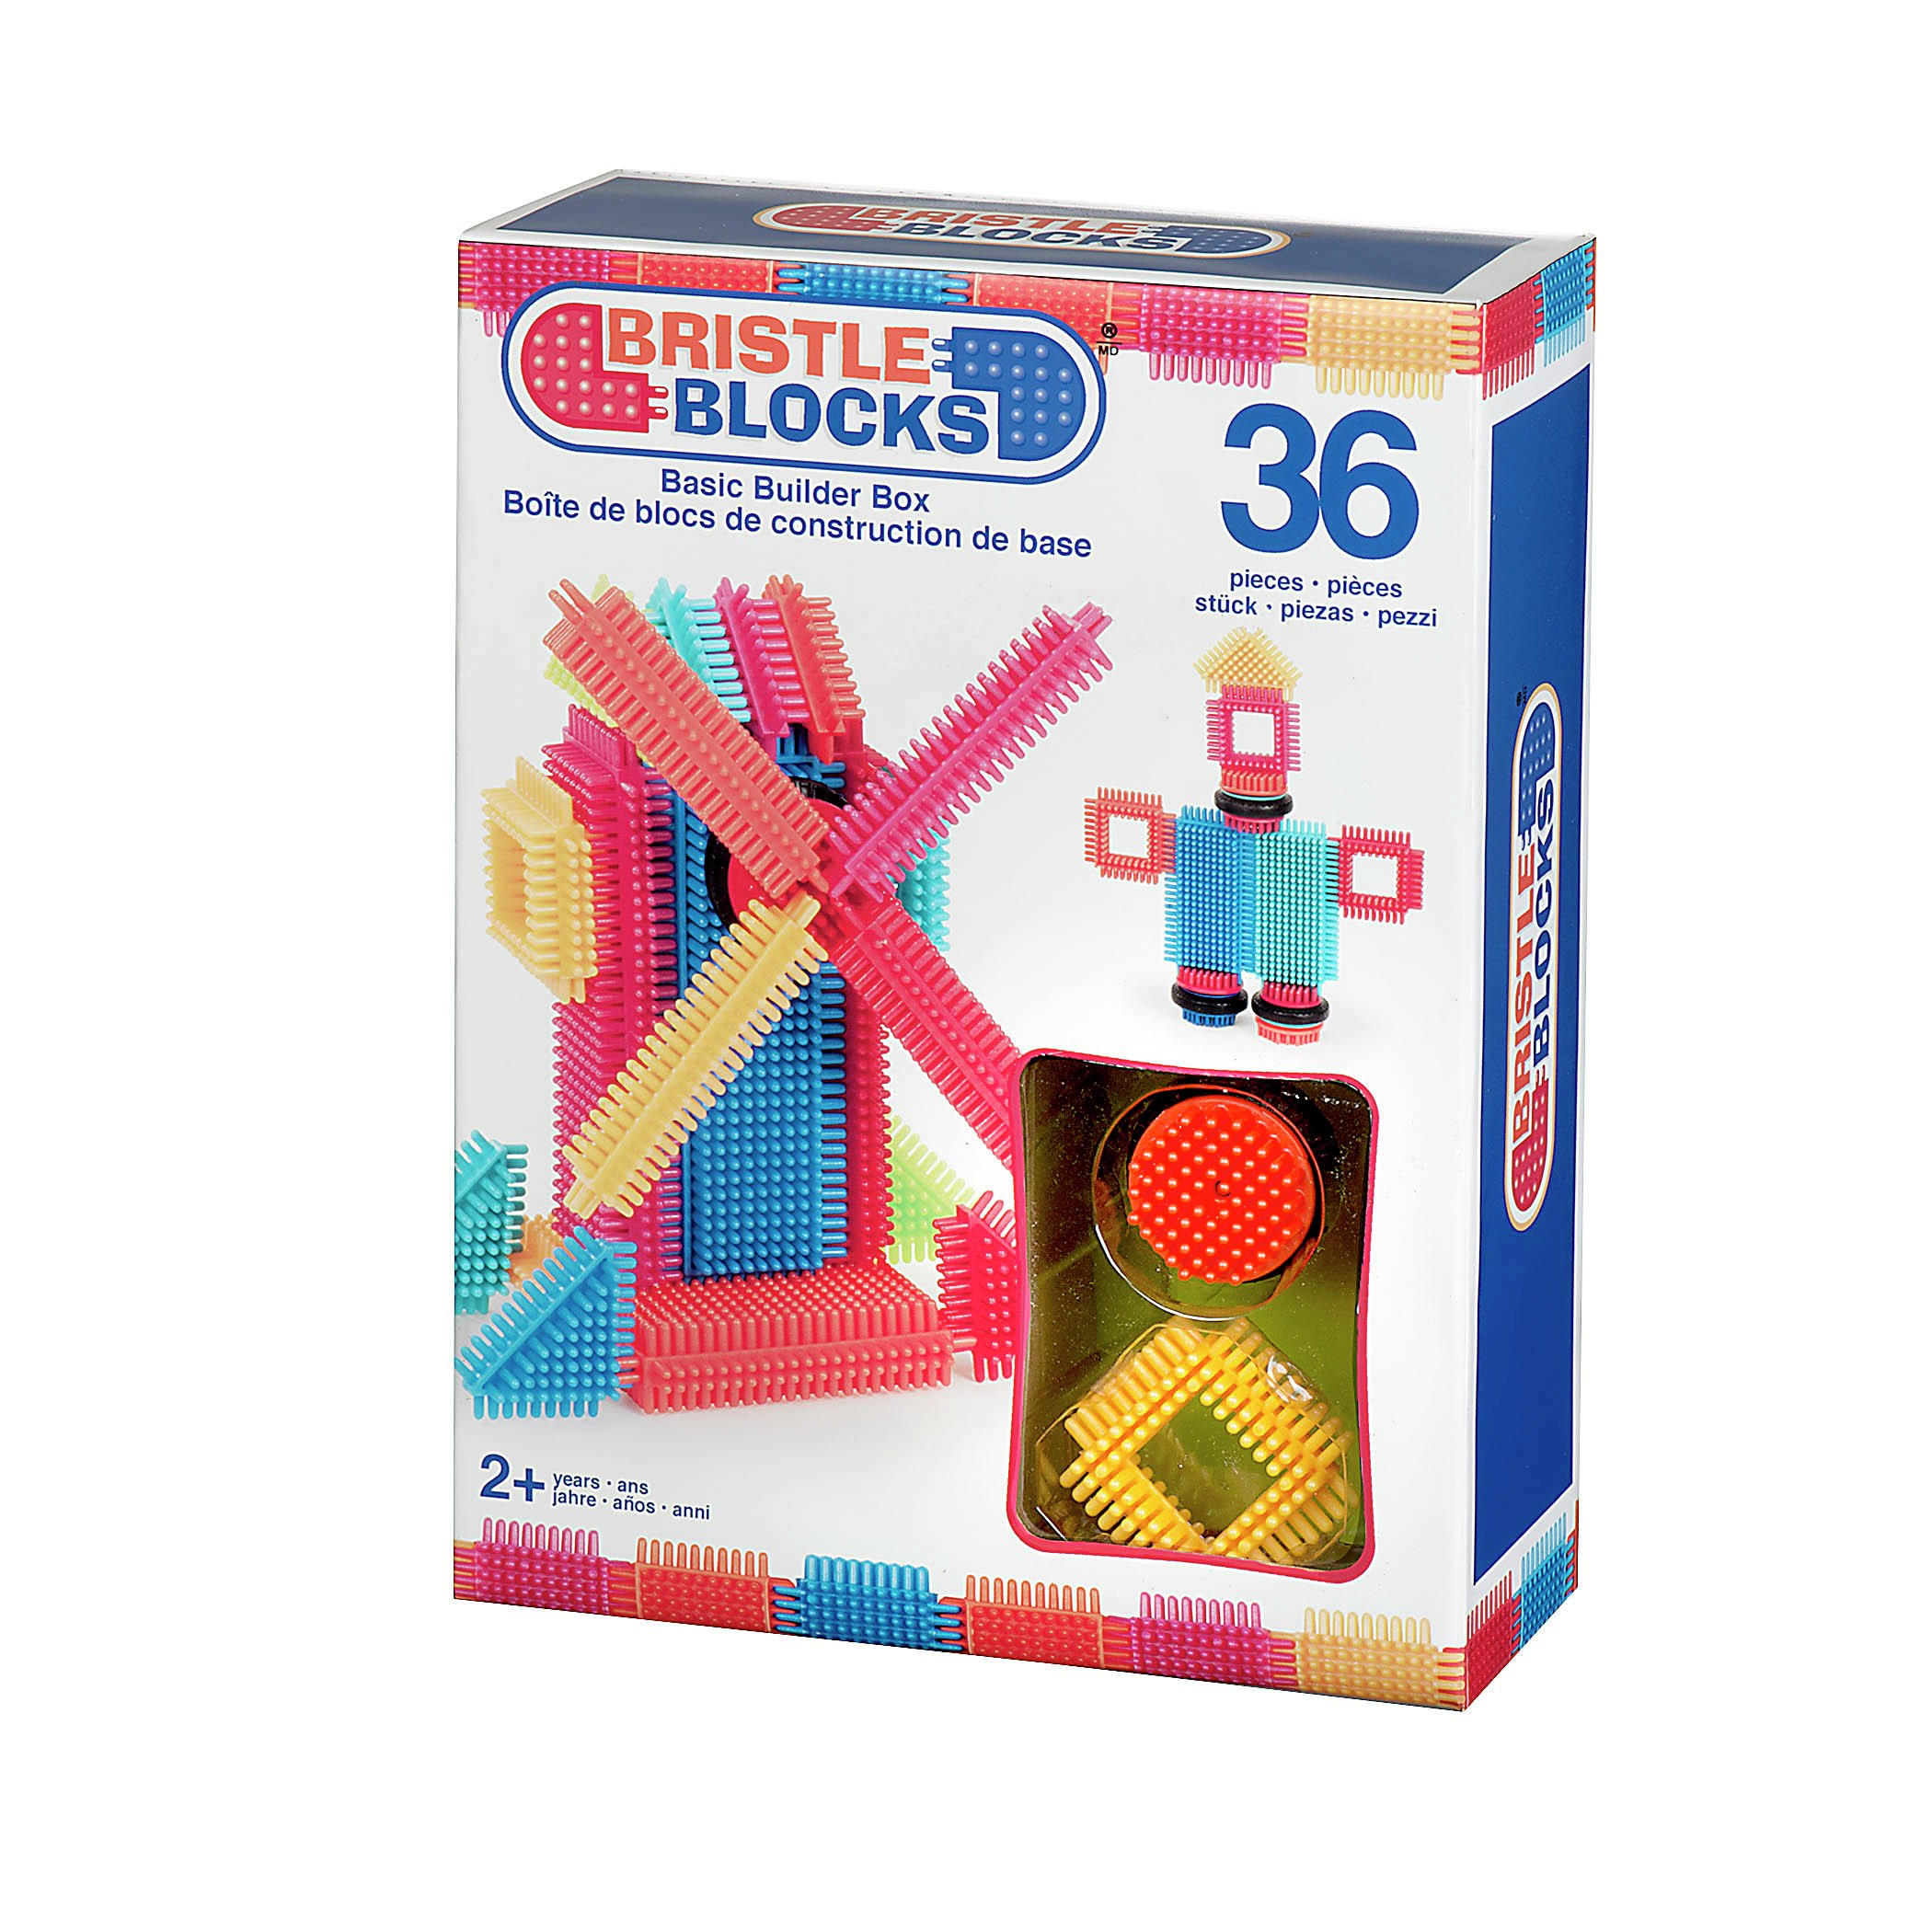 Image of Bristle Blocks - Basic Builder Box - 36 Pieces